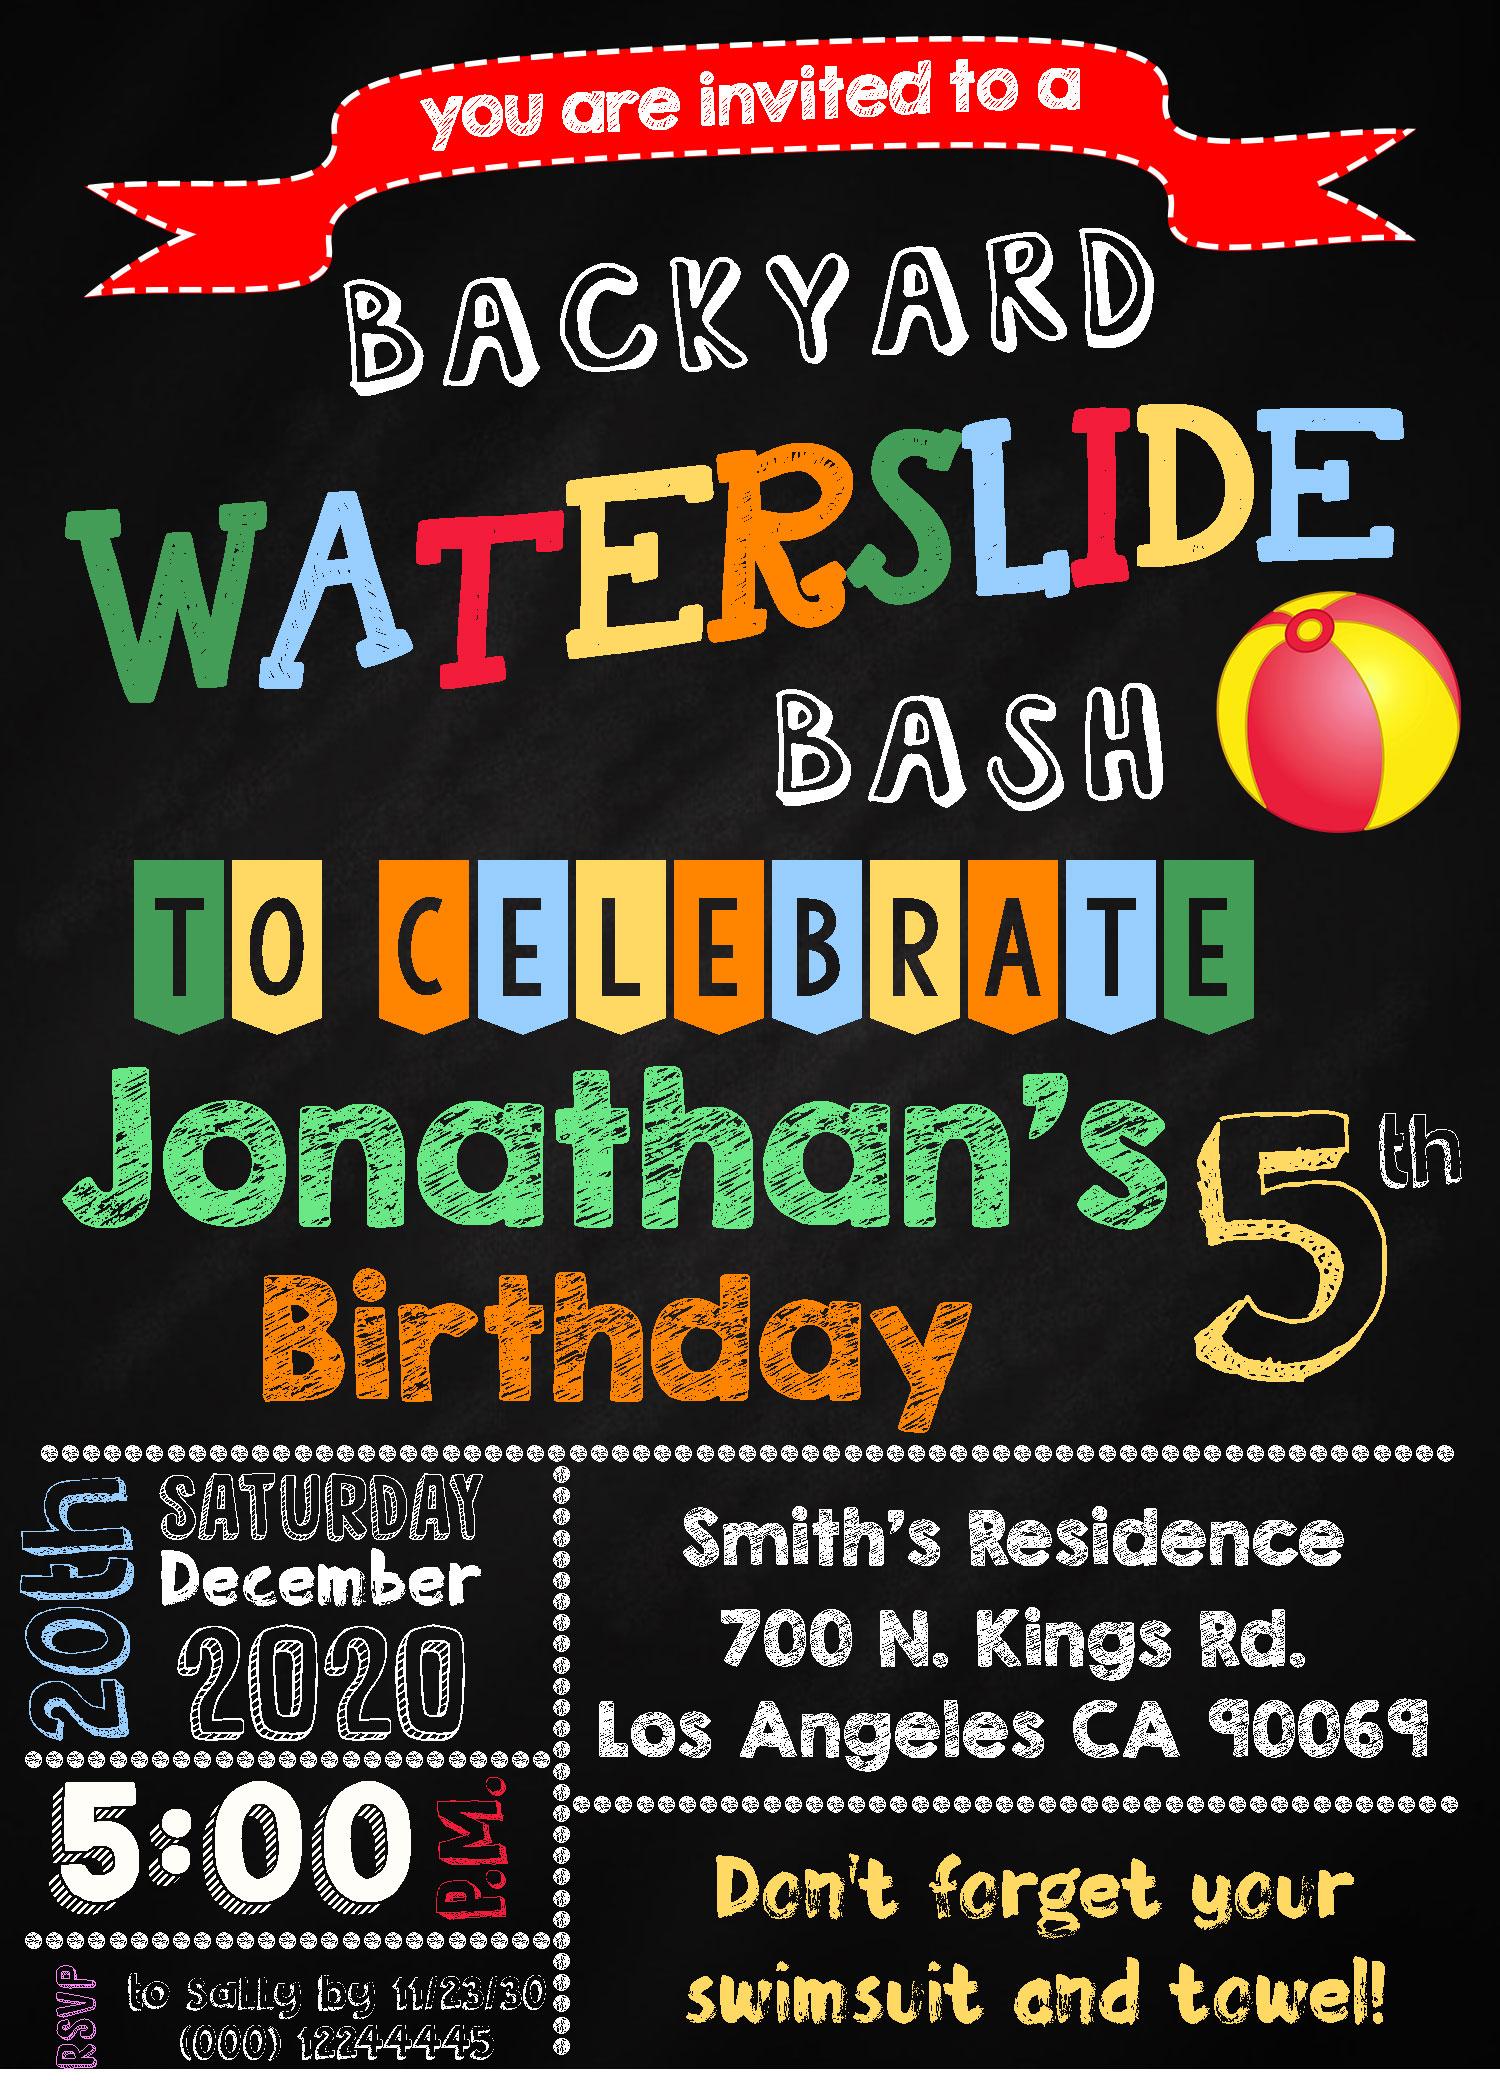 waterslide party birthday invitation